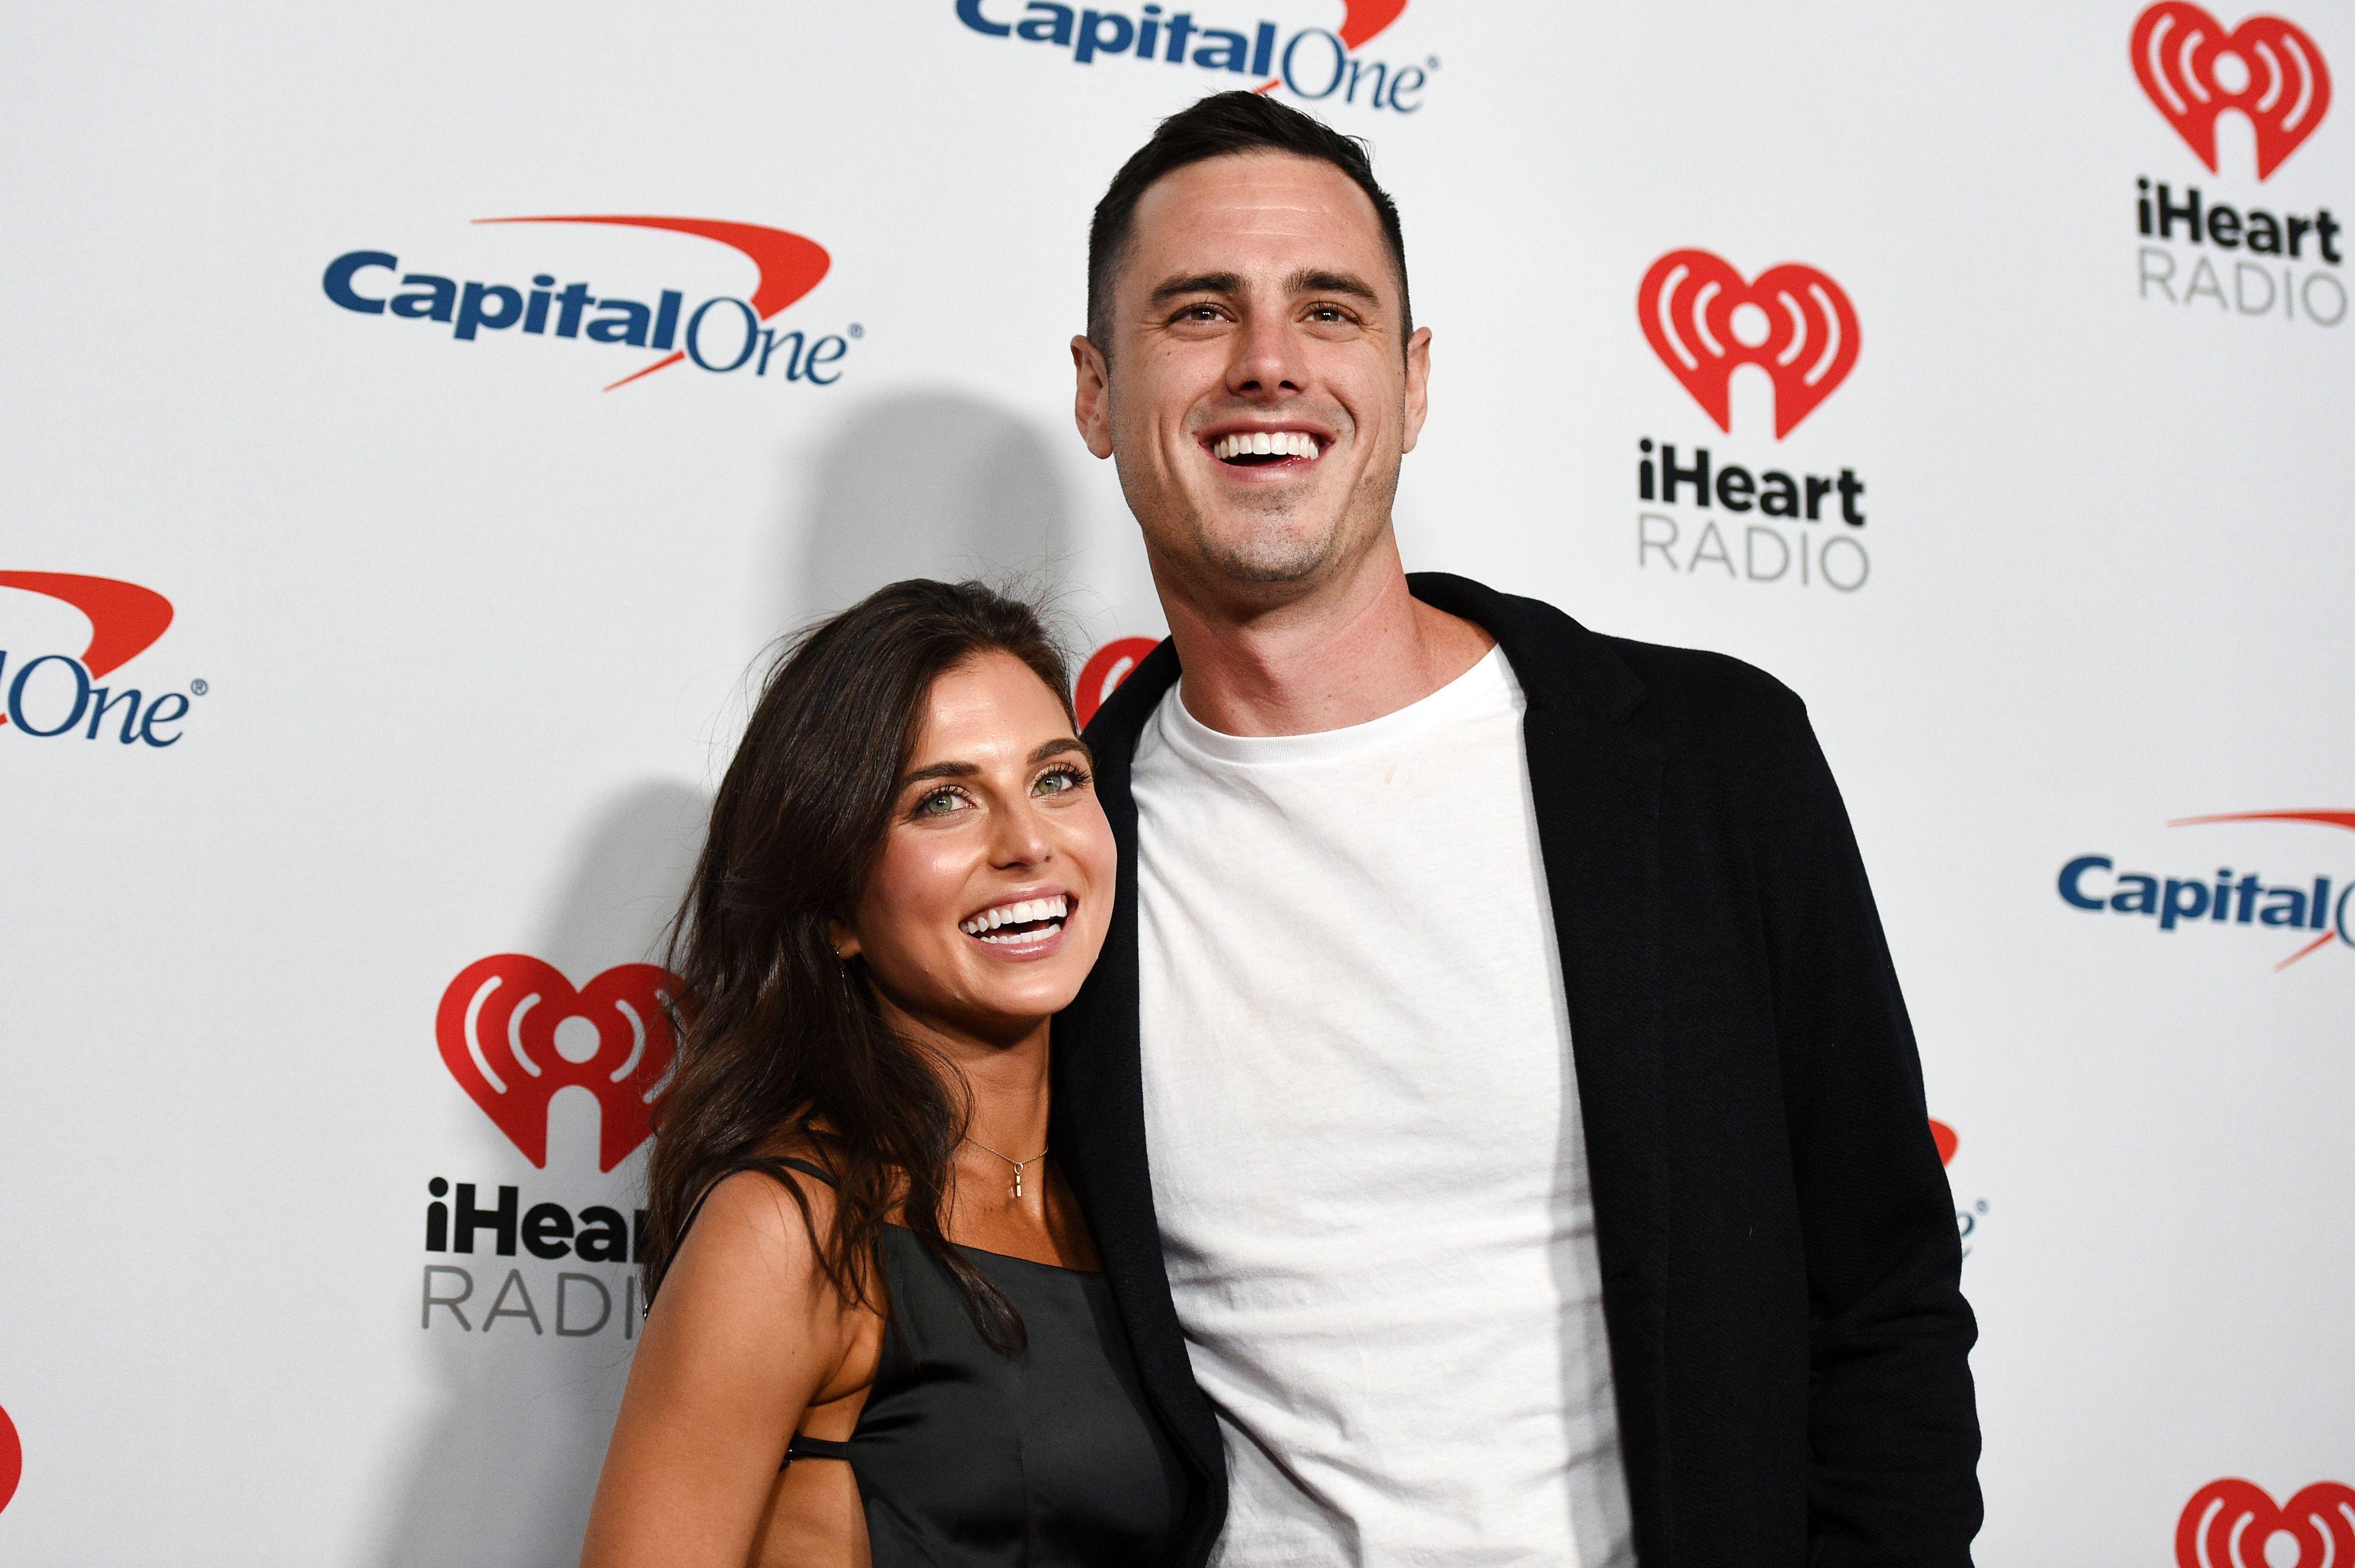 Ben Higgins with girlfriend Jess Clarke at an IHeart Radio event